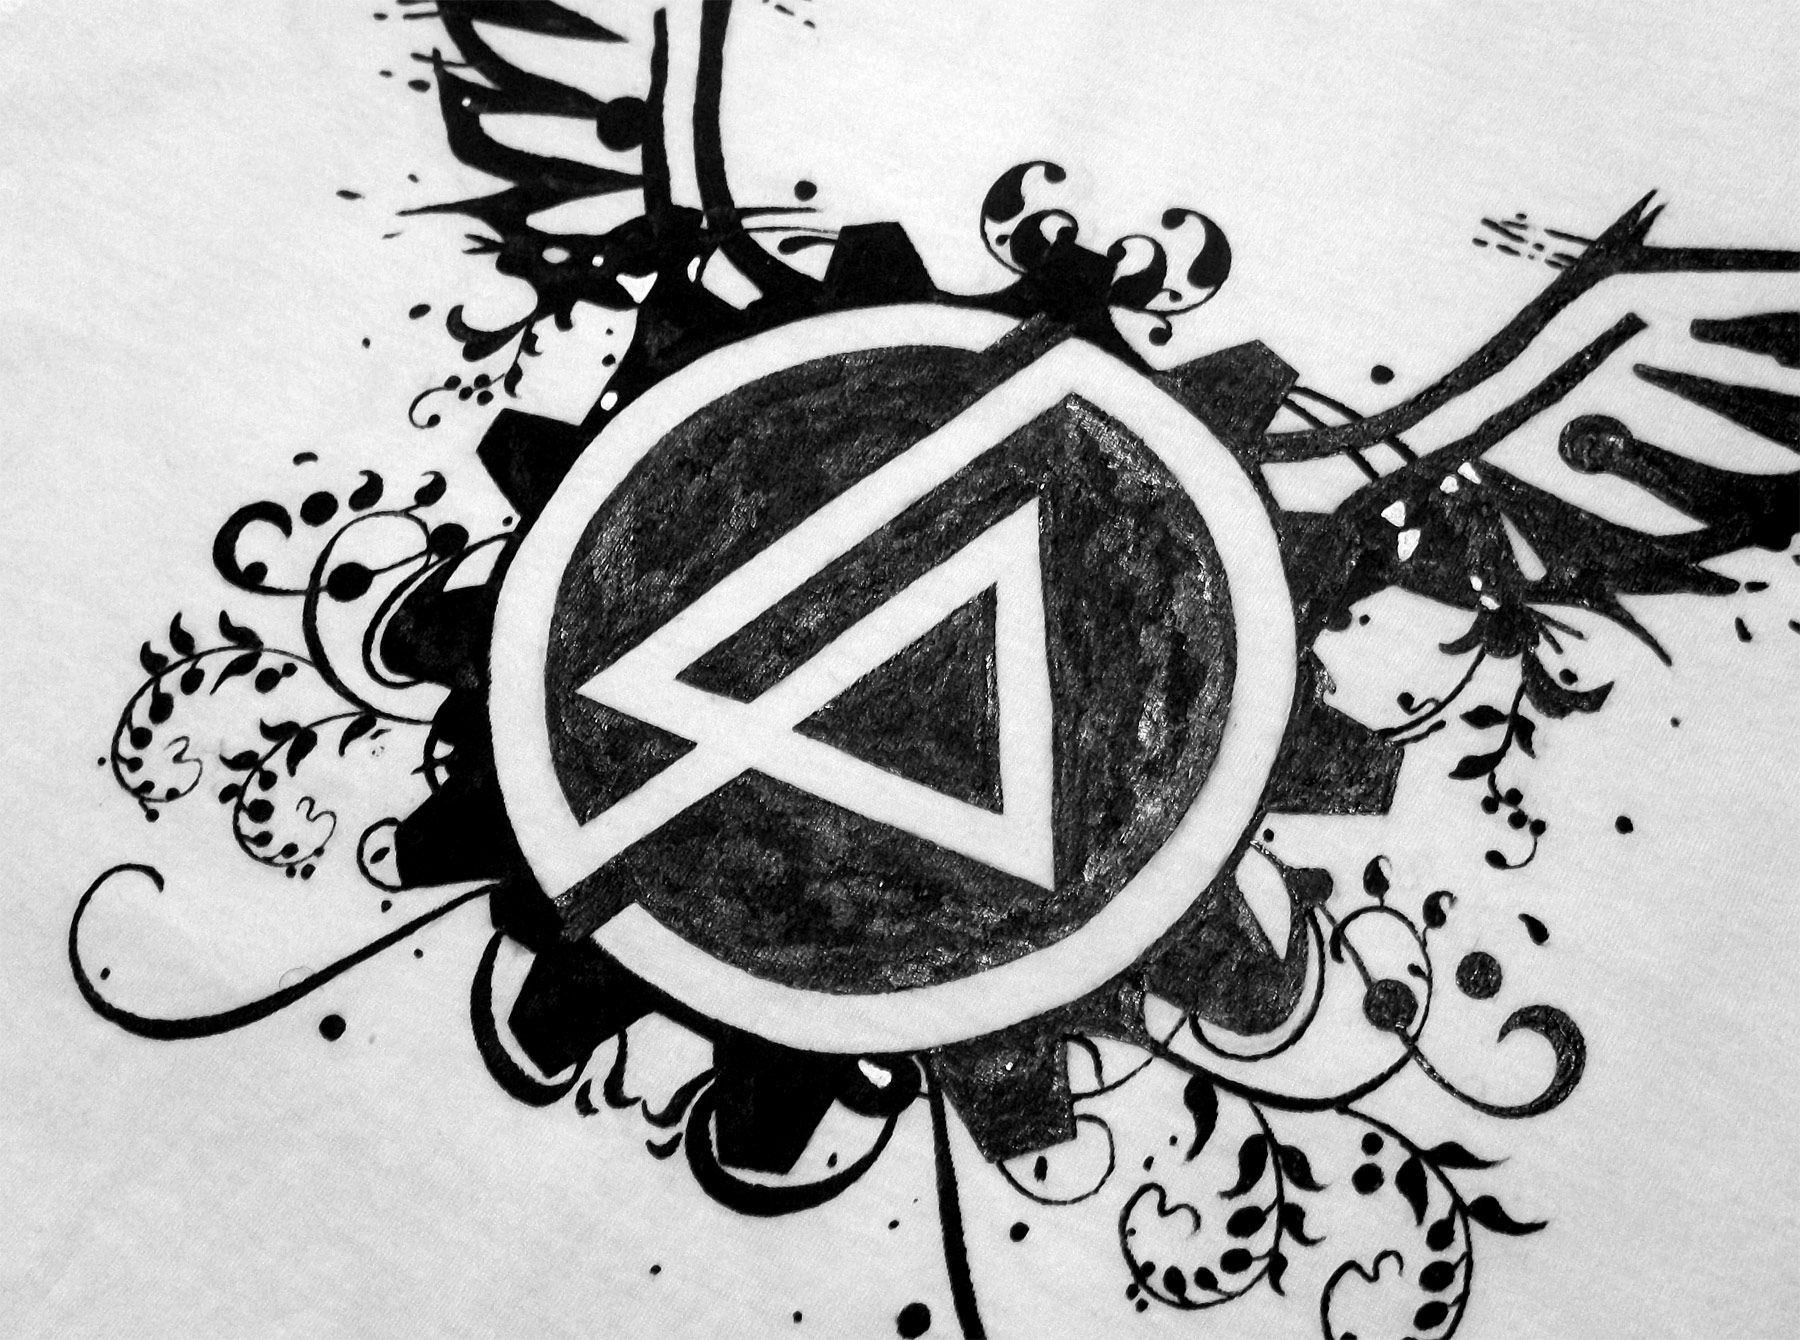 Linkin Park Symbol Google Search Music In 2018 Pinterest